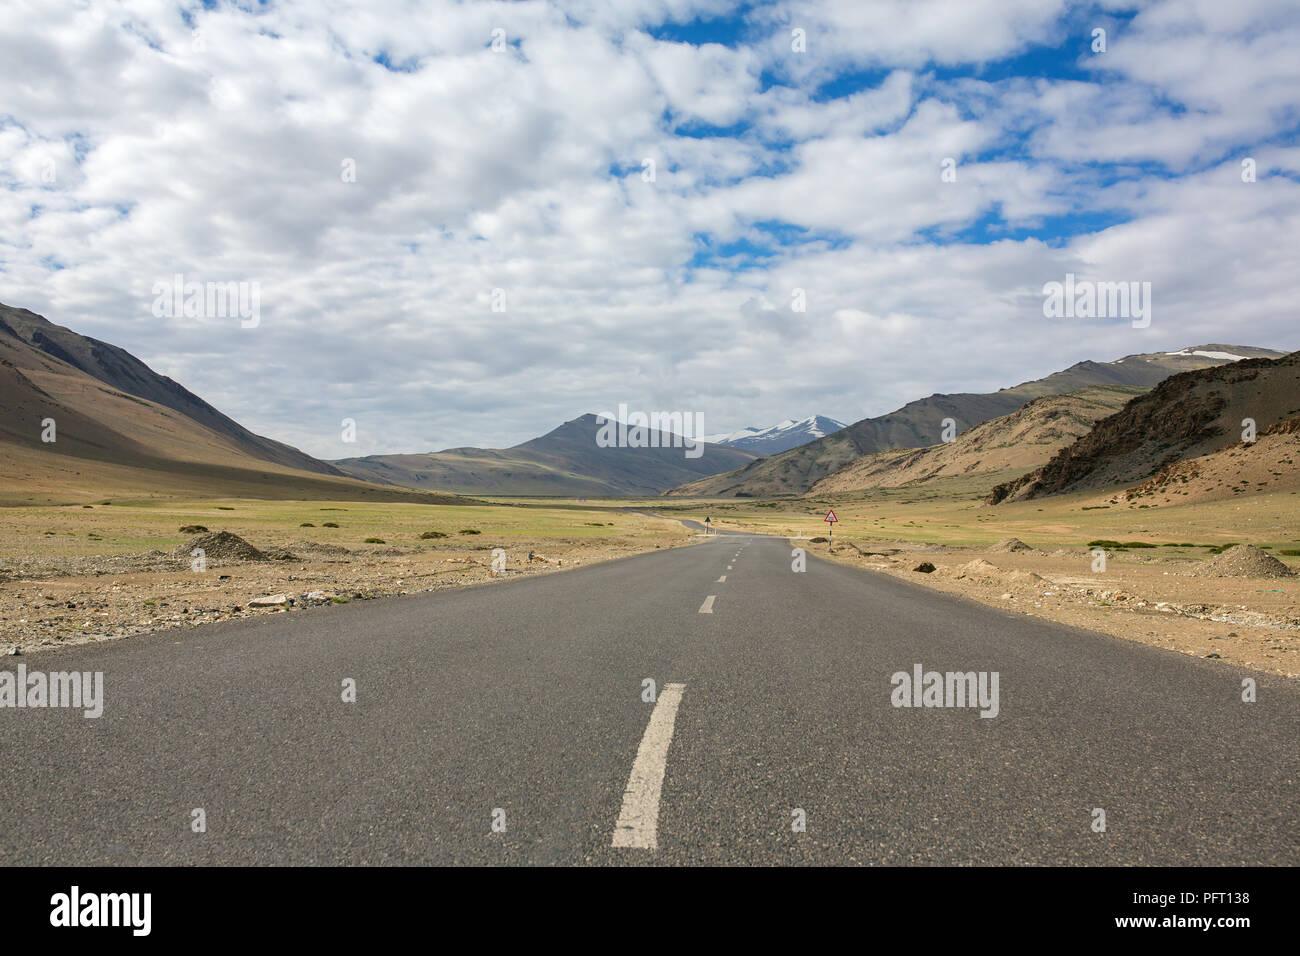 Trans Himalayan Manali - Leh highway in Himalayas. More plains, Ladakh, Jammu and Kashmir, India. - Stock Image